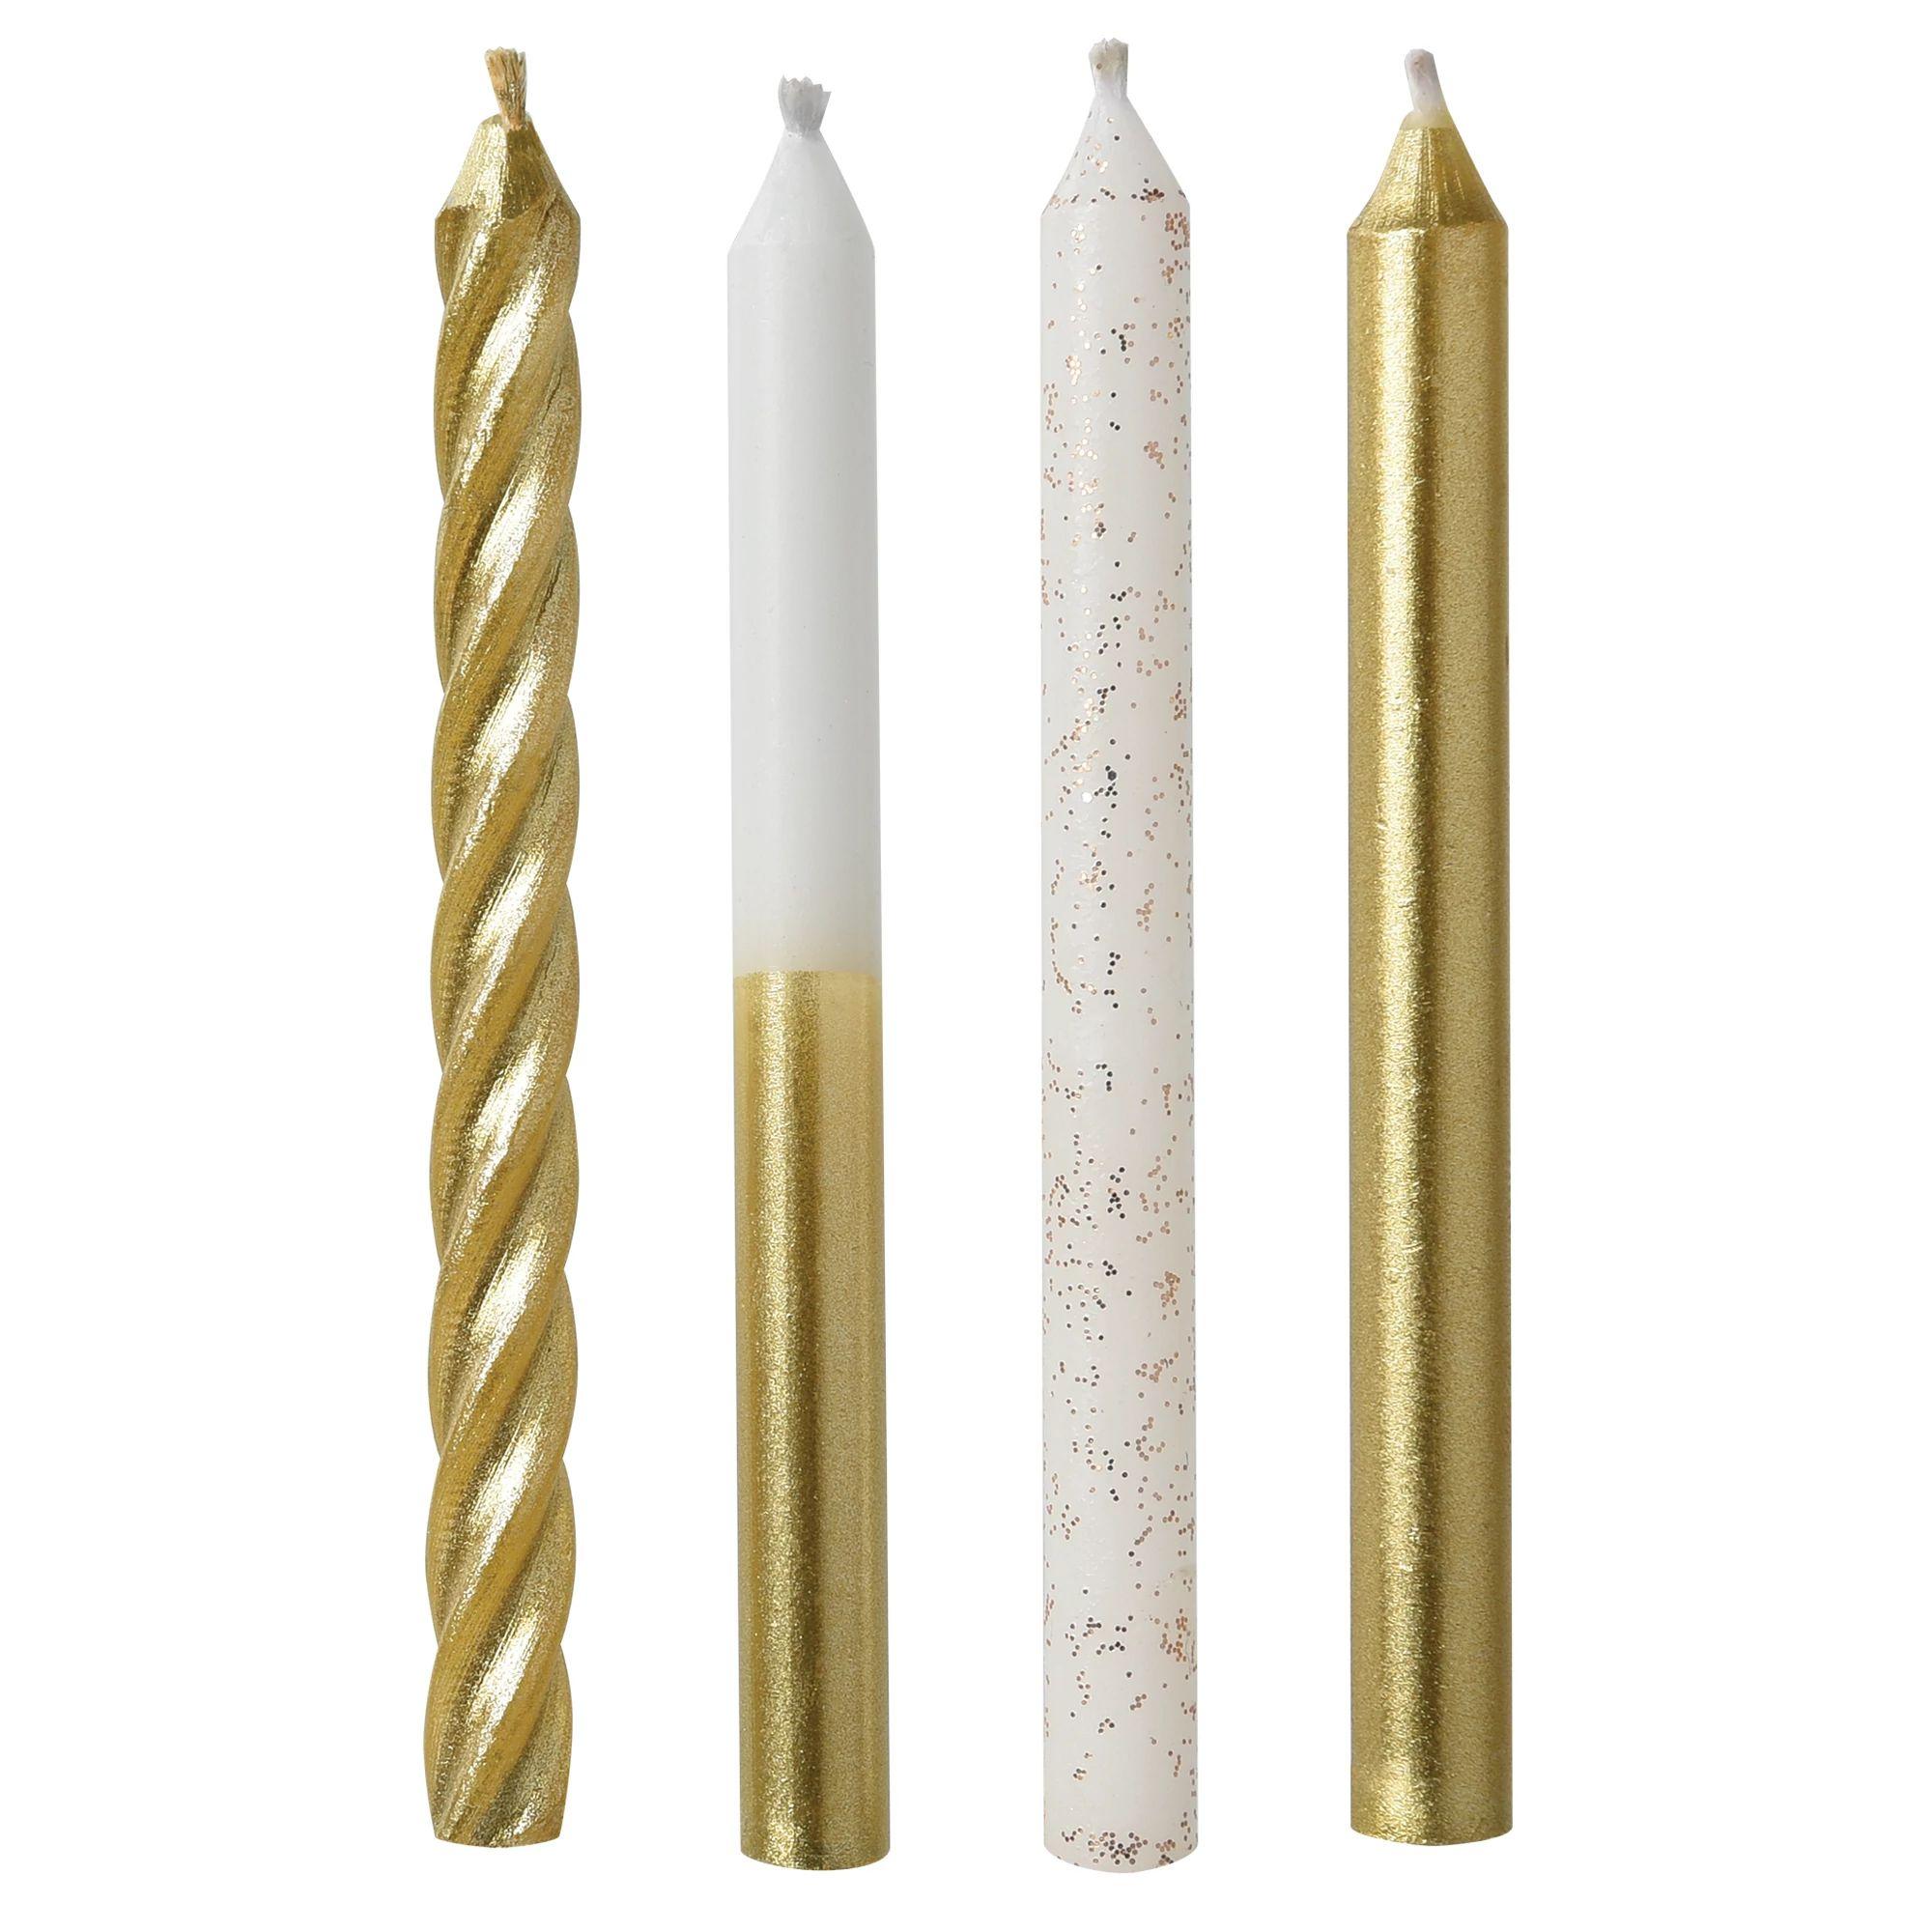 Gold Metallic Mixes w/Glitter